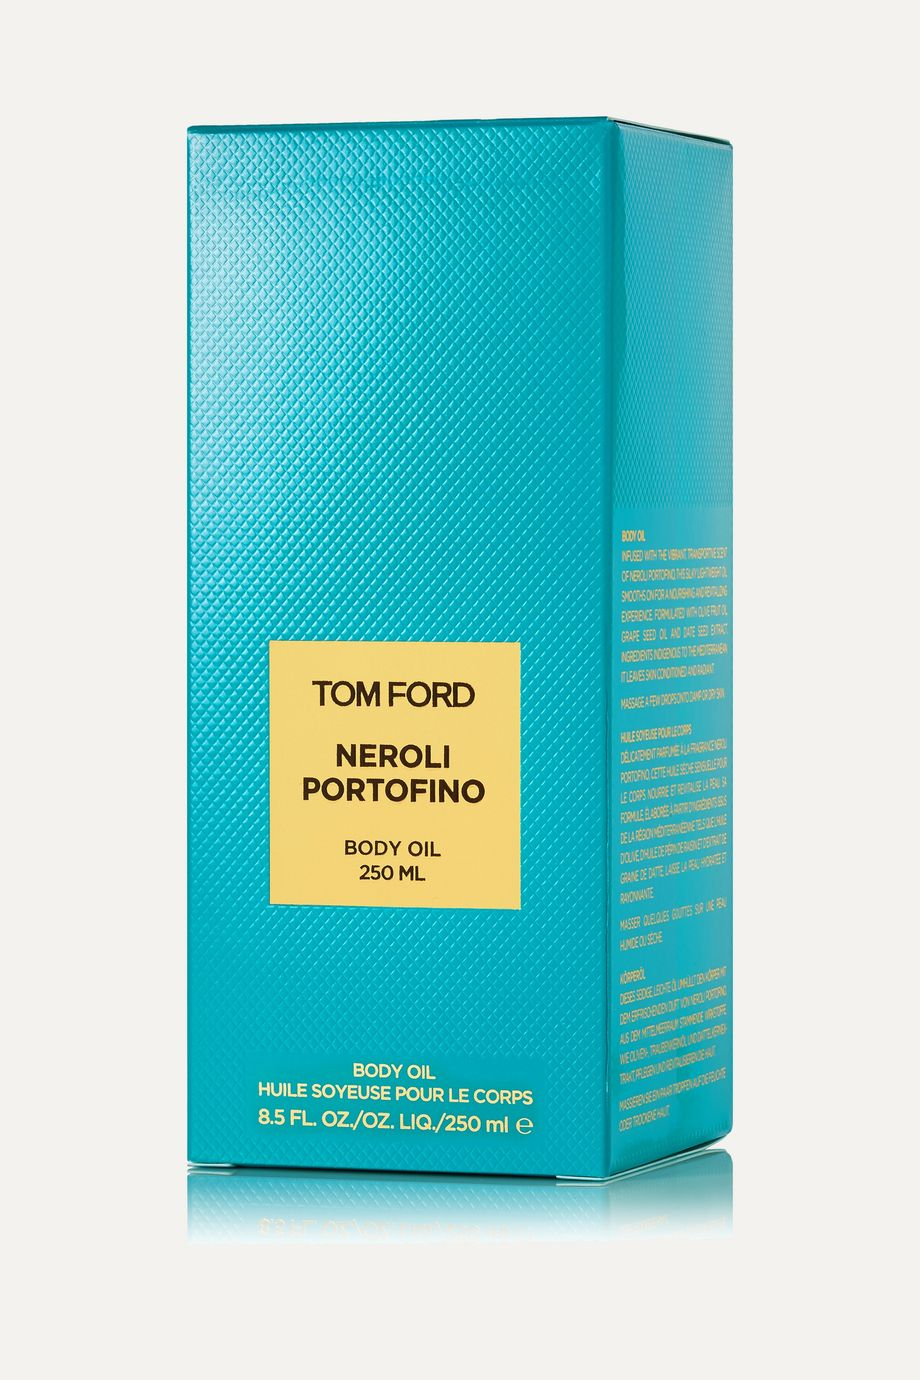 TOM FORD BEAUTY Neroli Portofino Body Oil, 250ml